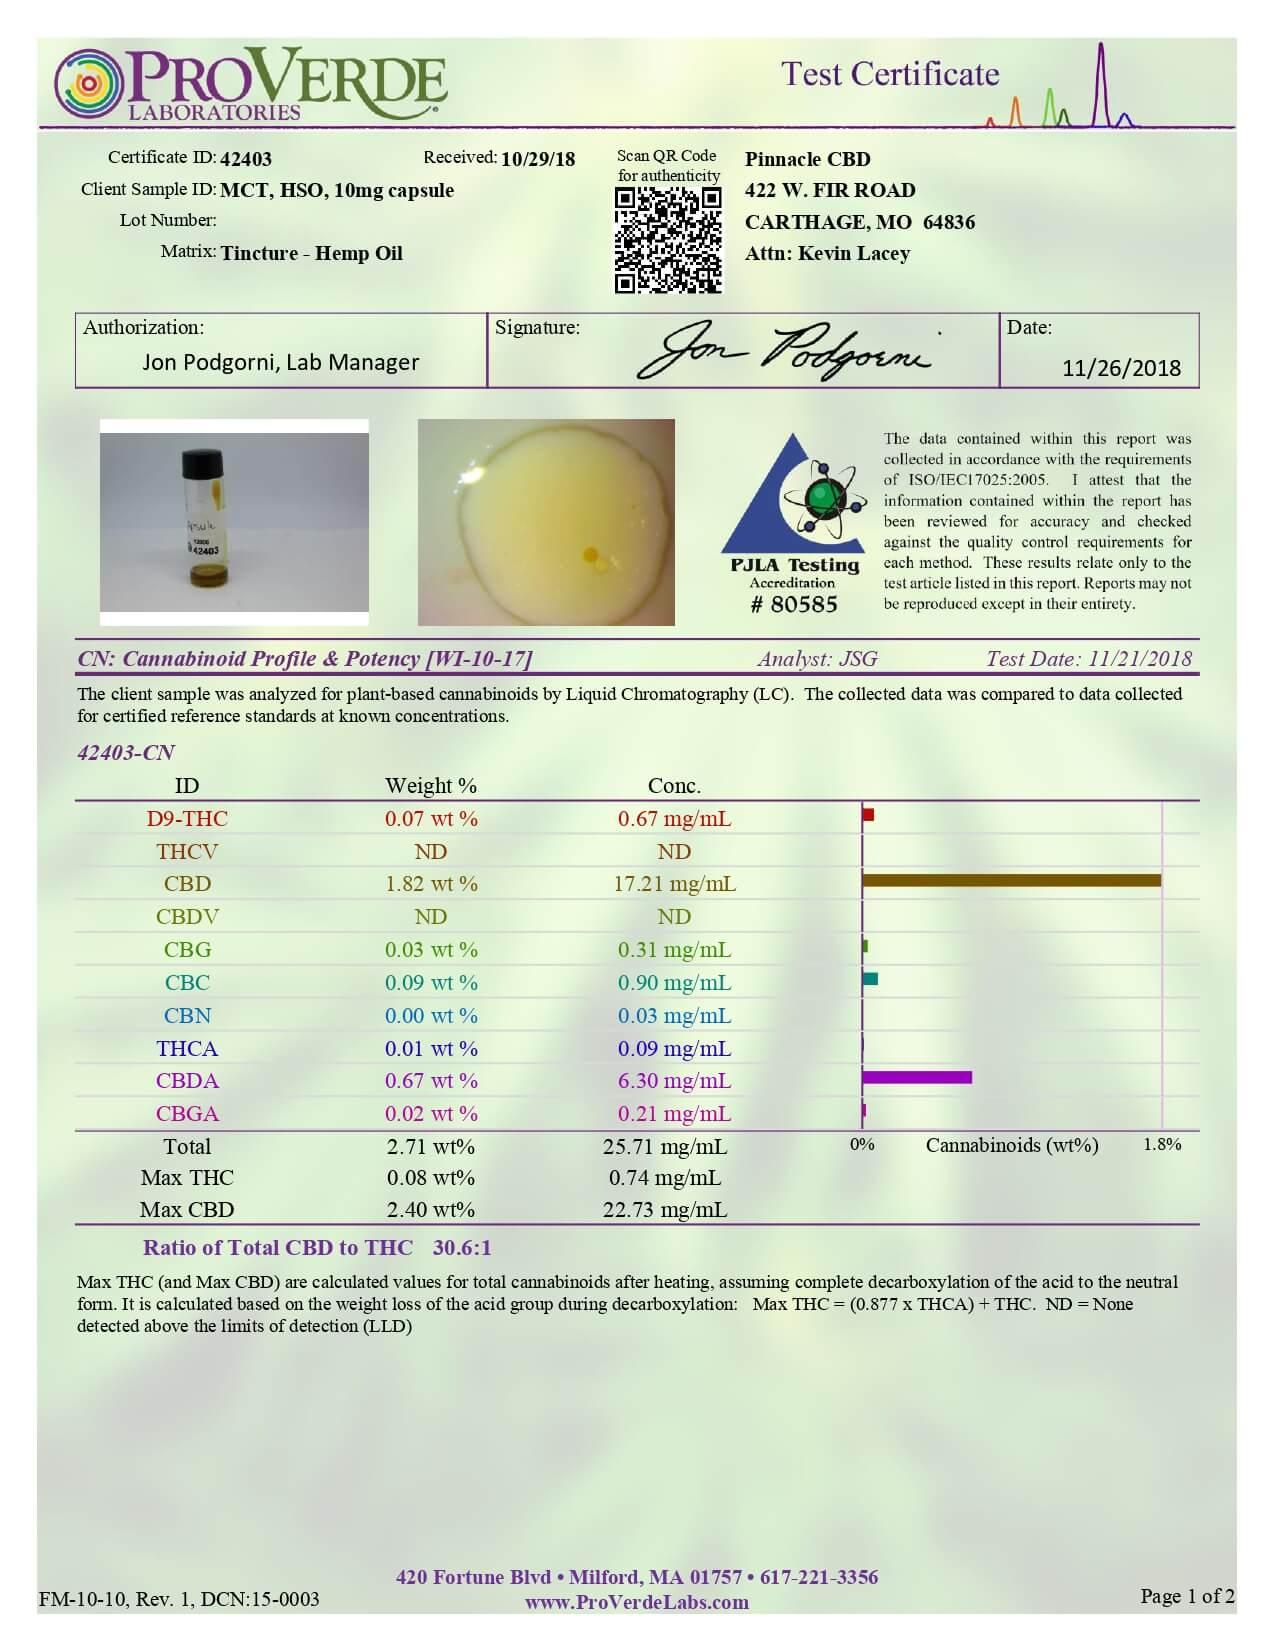 Pinnacle Hemp CBD Capsule Full Spectrum Lab Report